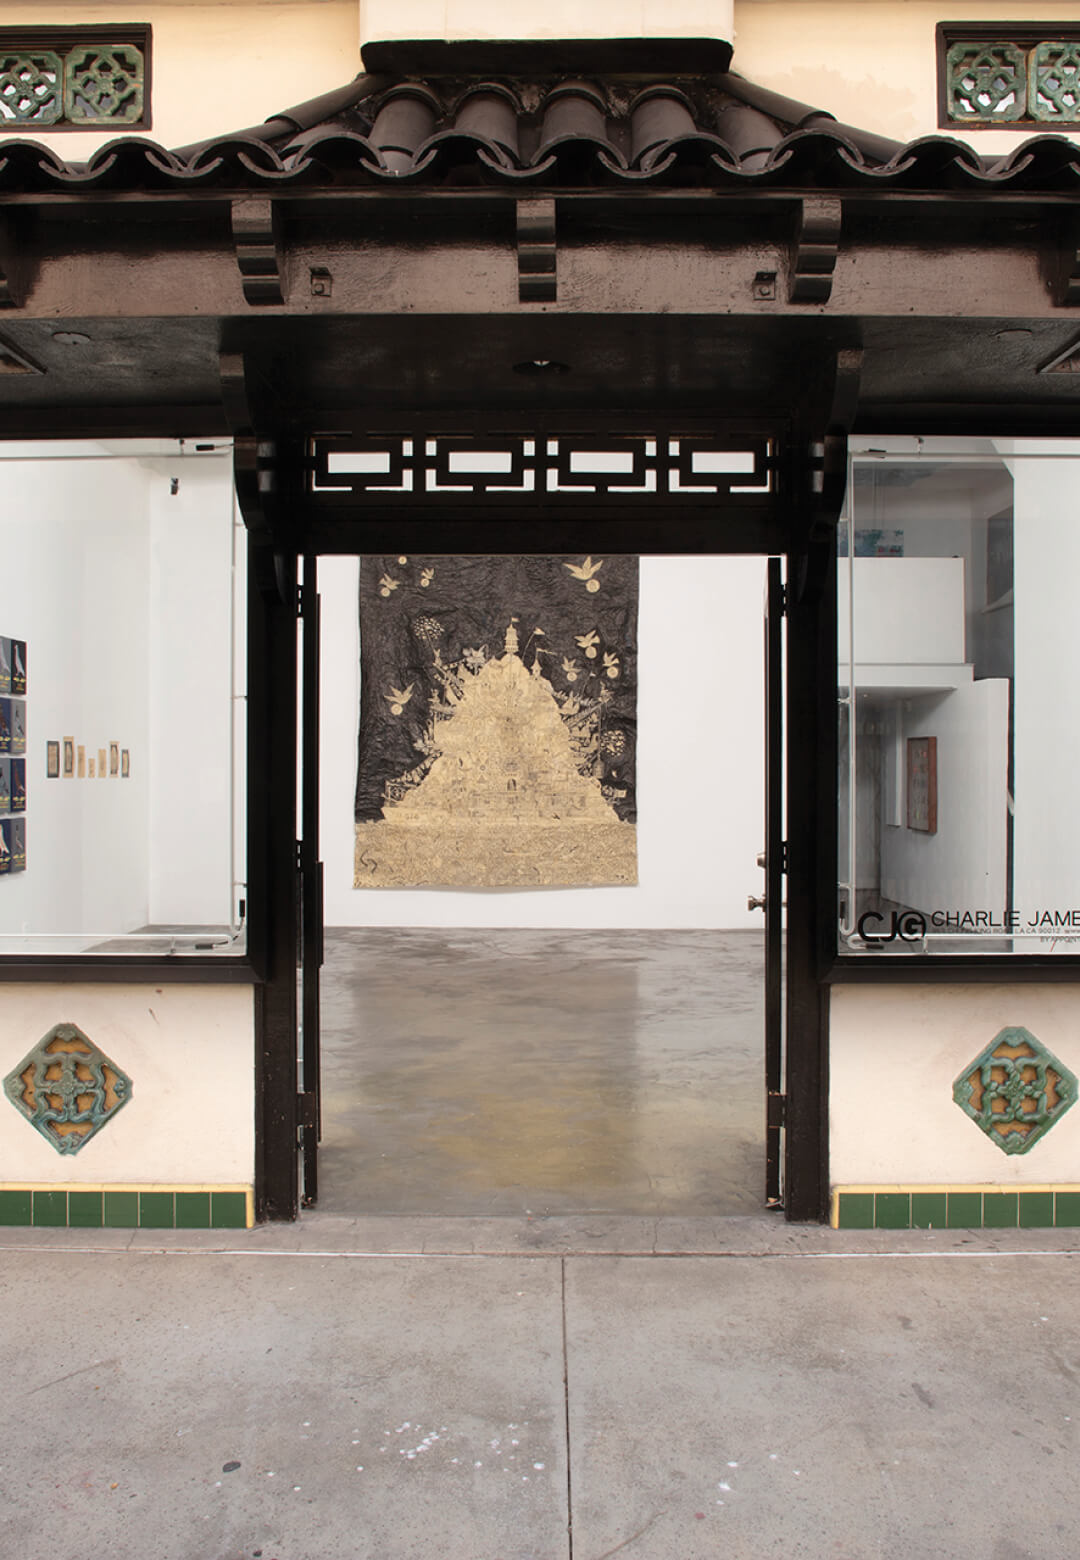 A view of Far Away at Charlie James Gallery, Los Angeles | Far Away| Duke Riley| STIRworld